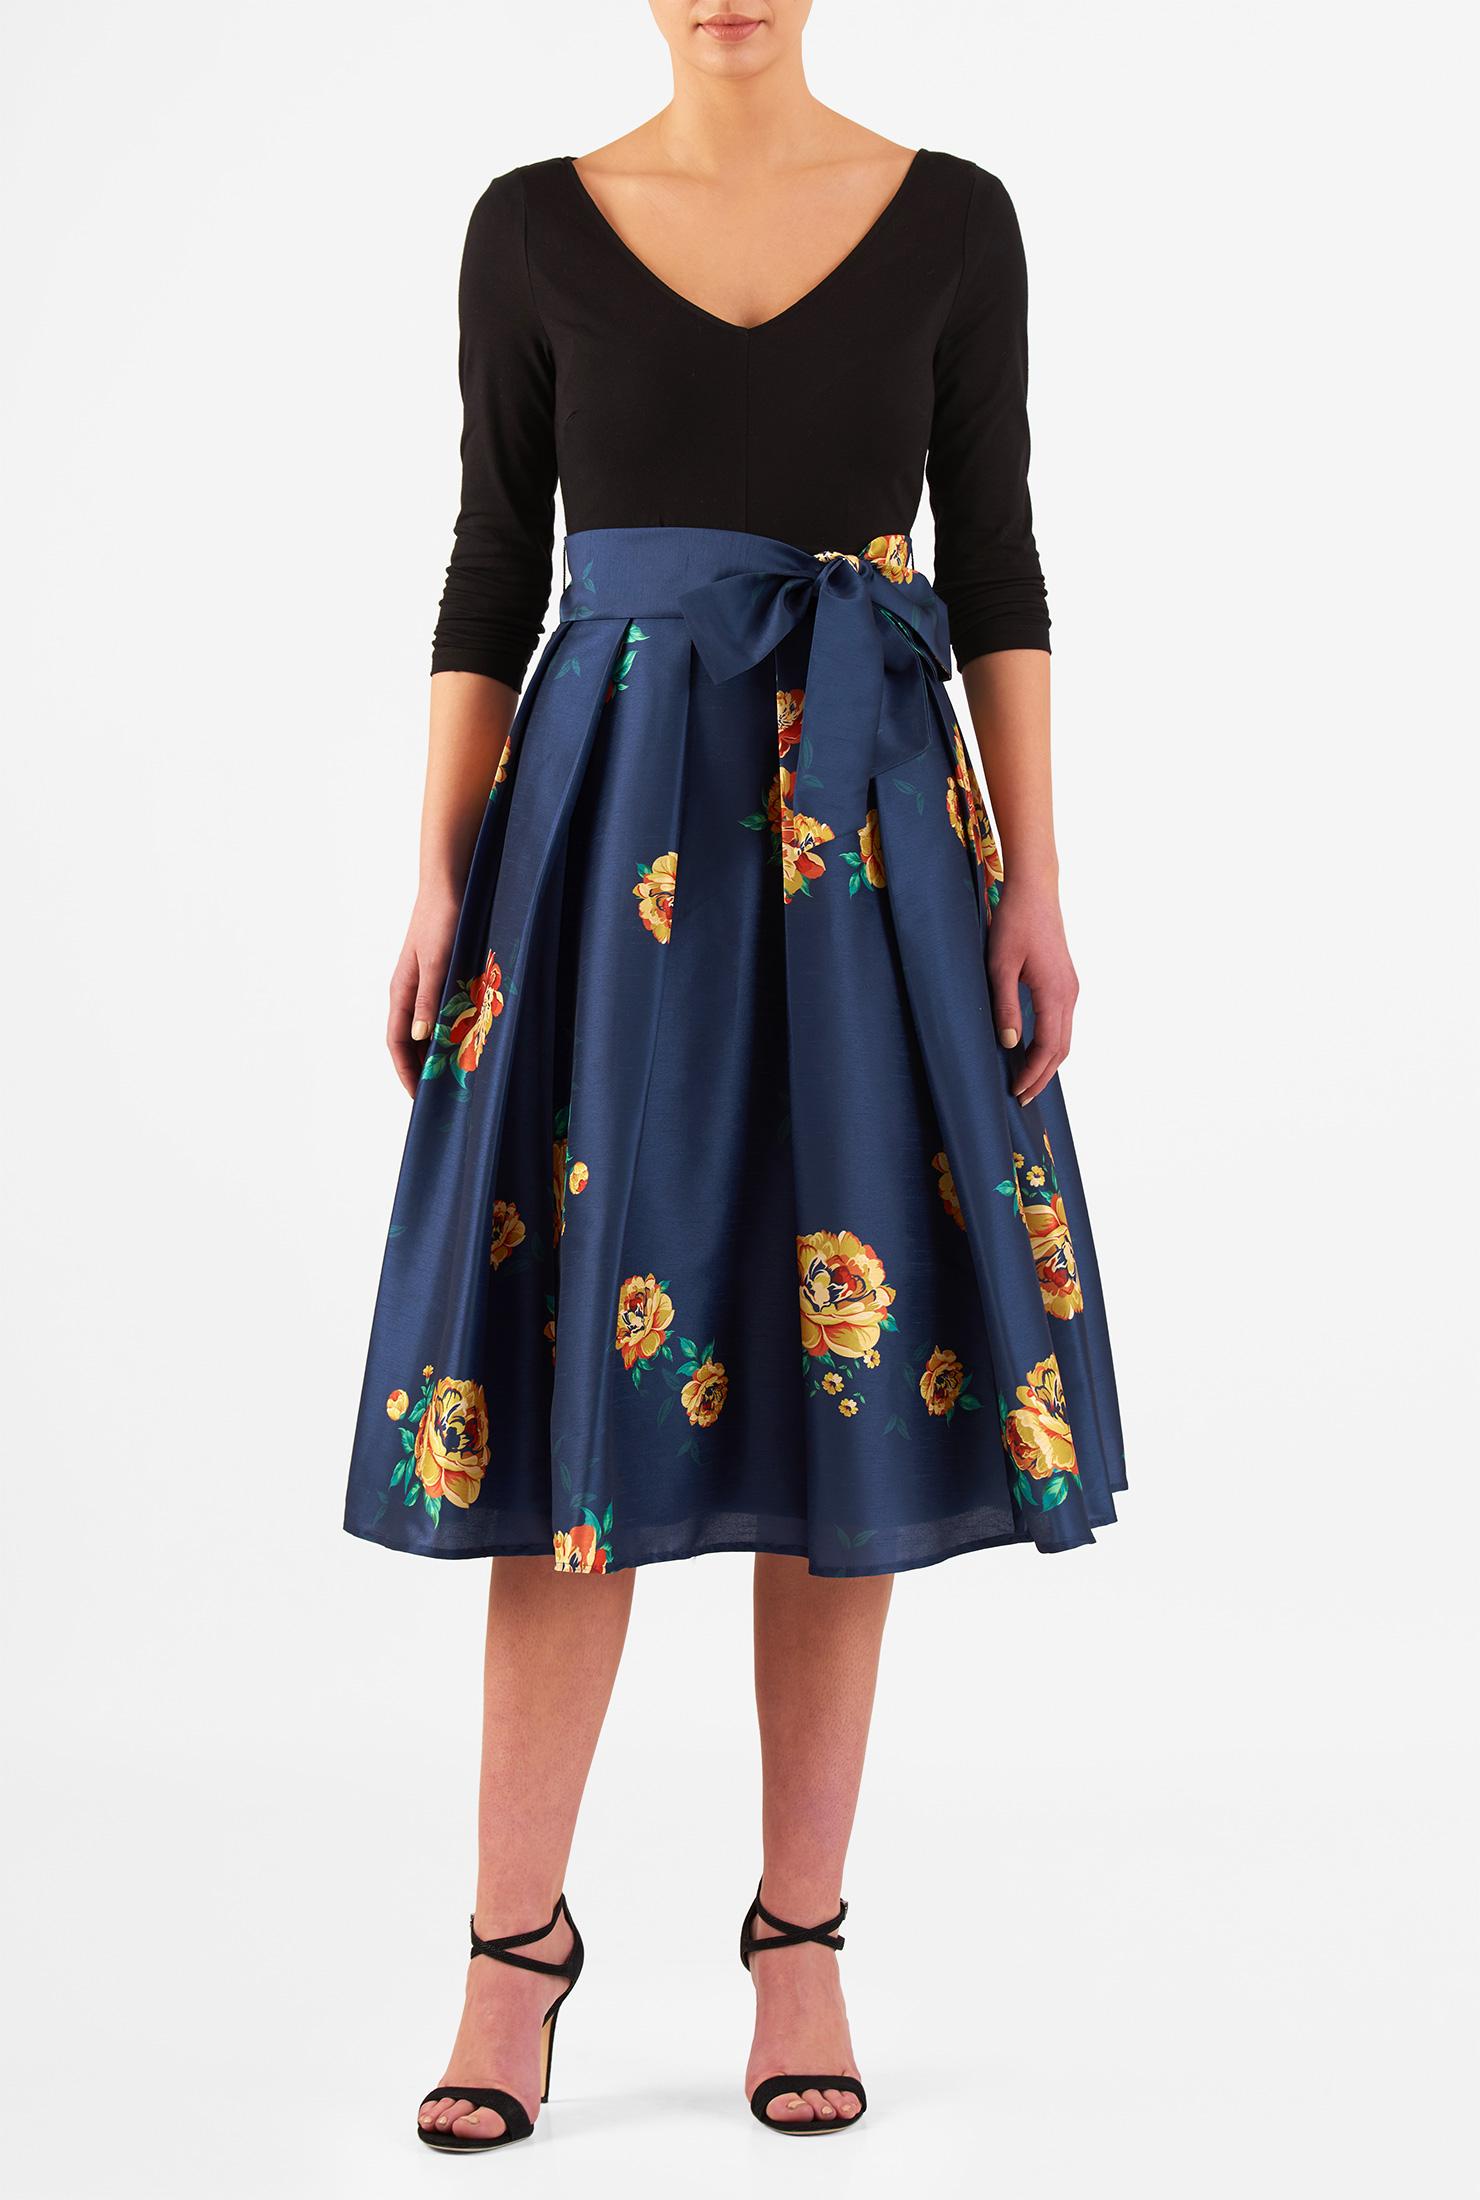 Eshakti Women S Floral Print Dupioni And Cotton Knit Dress image